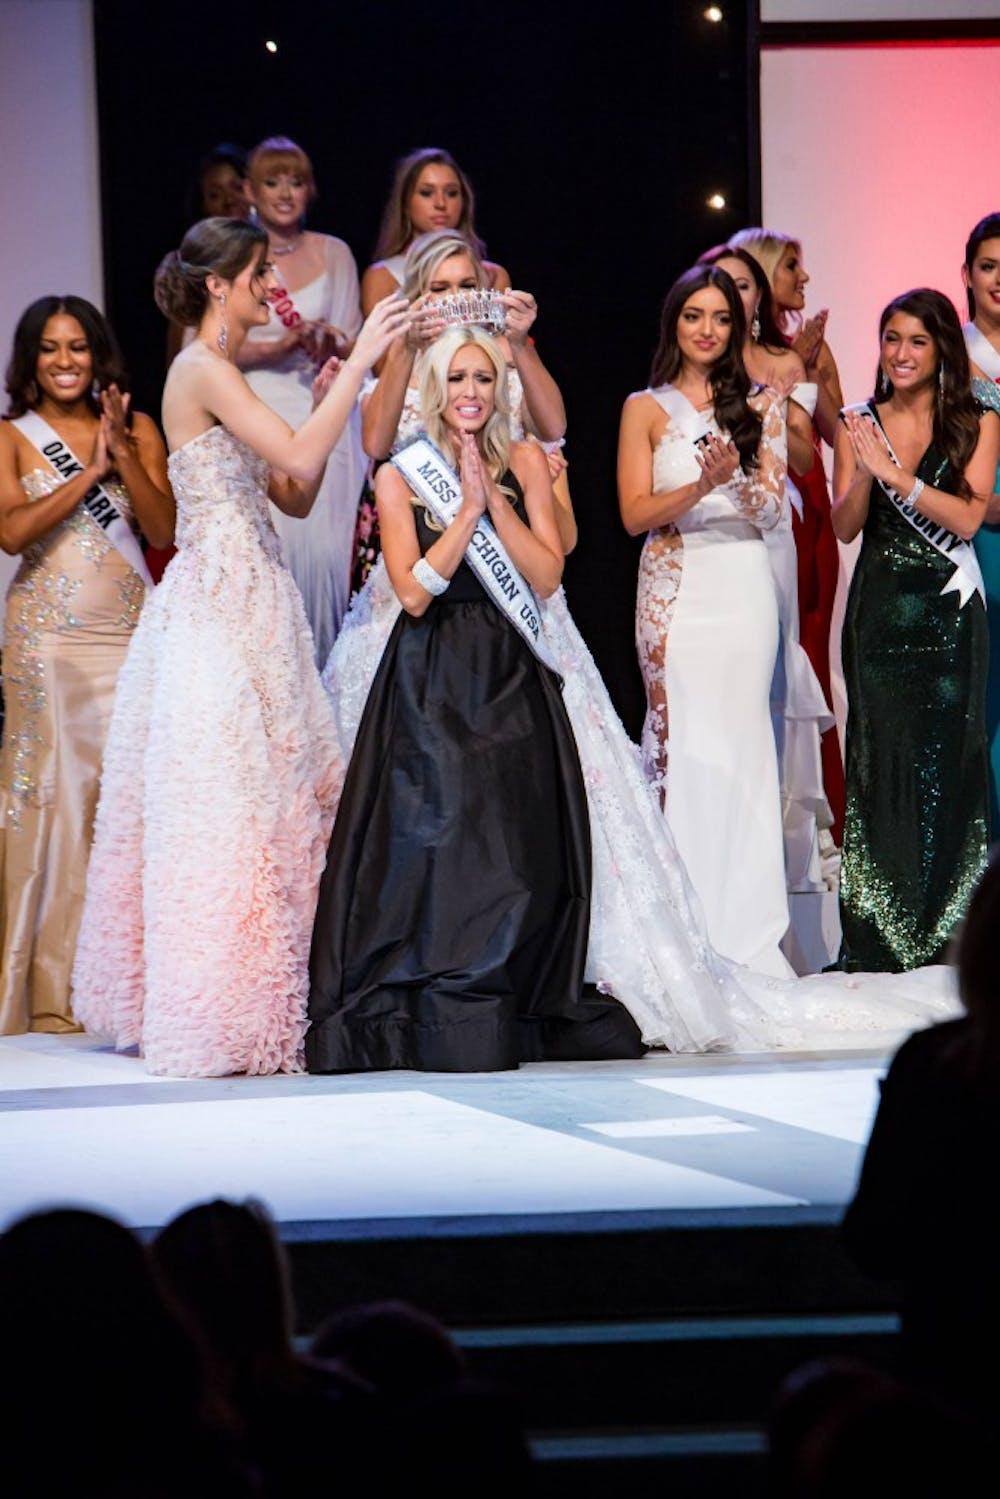 Miss Michigan USA